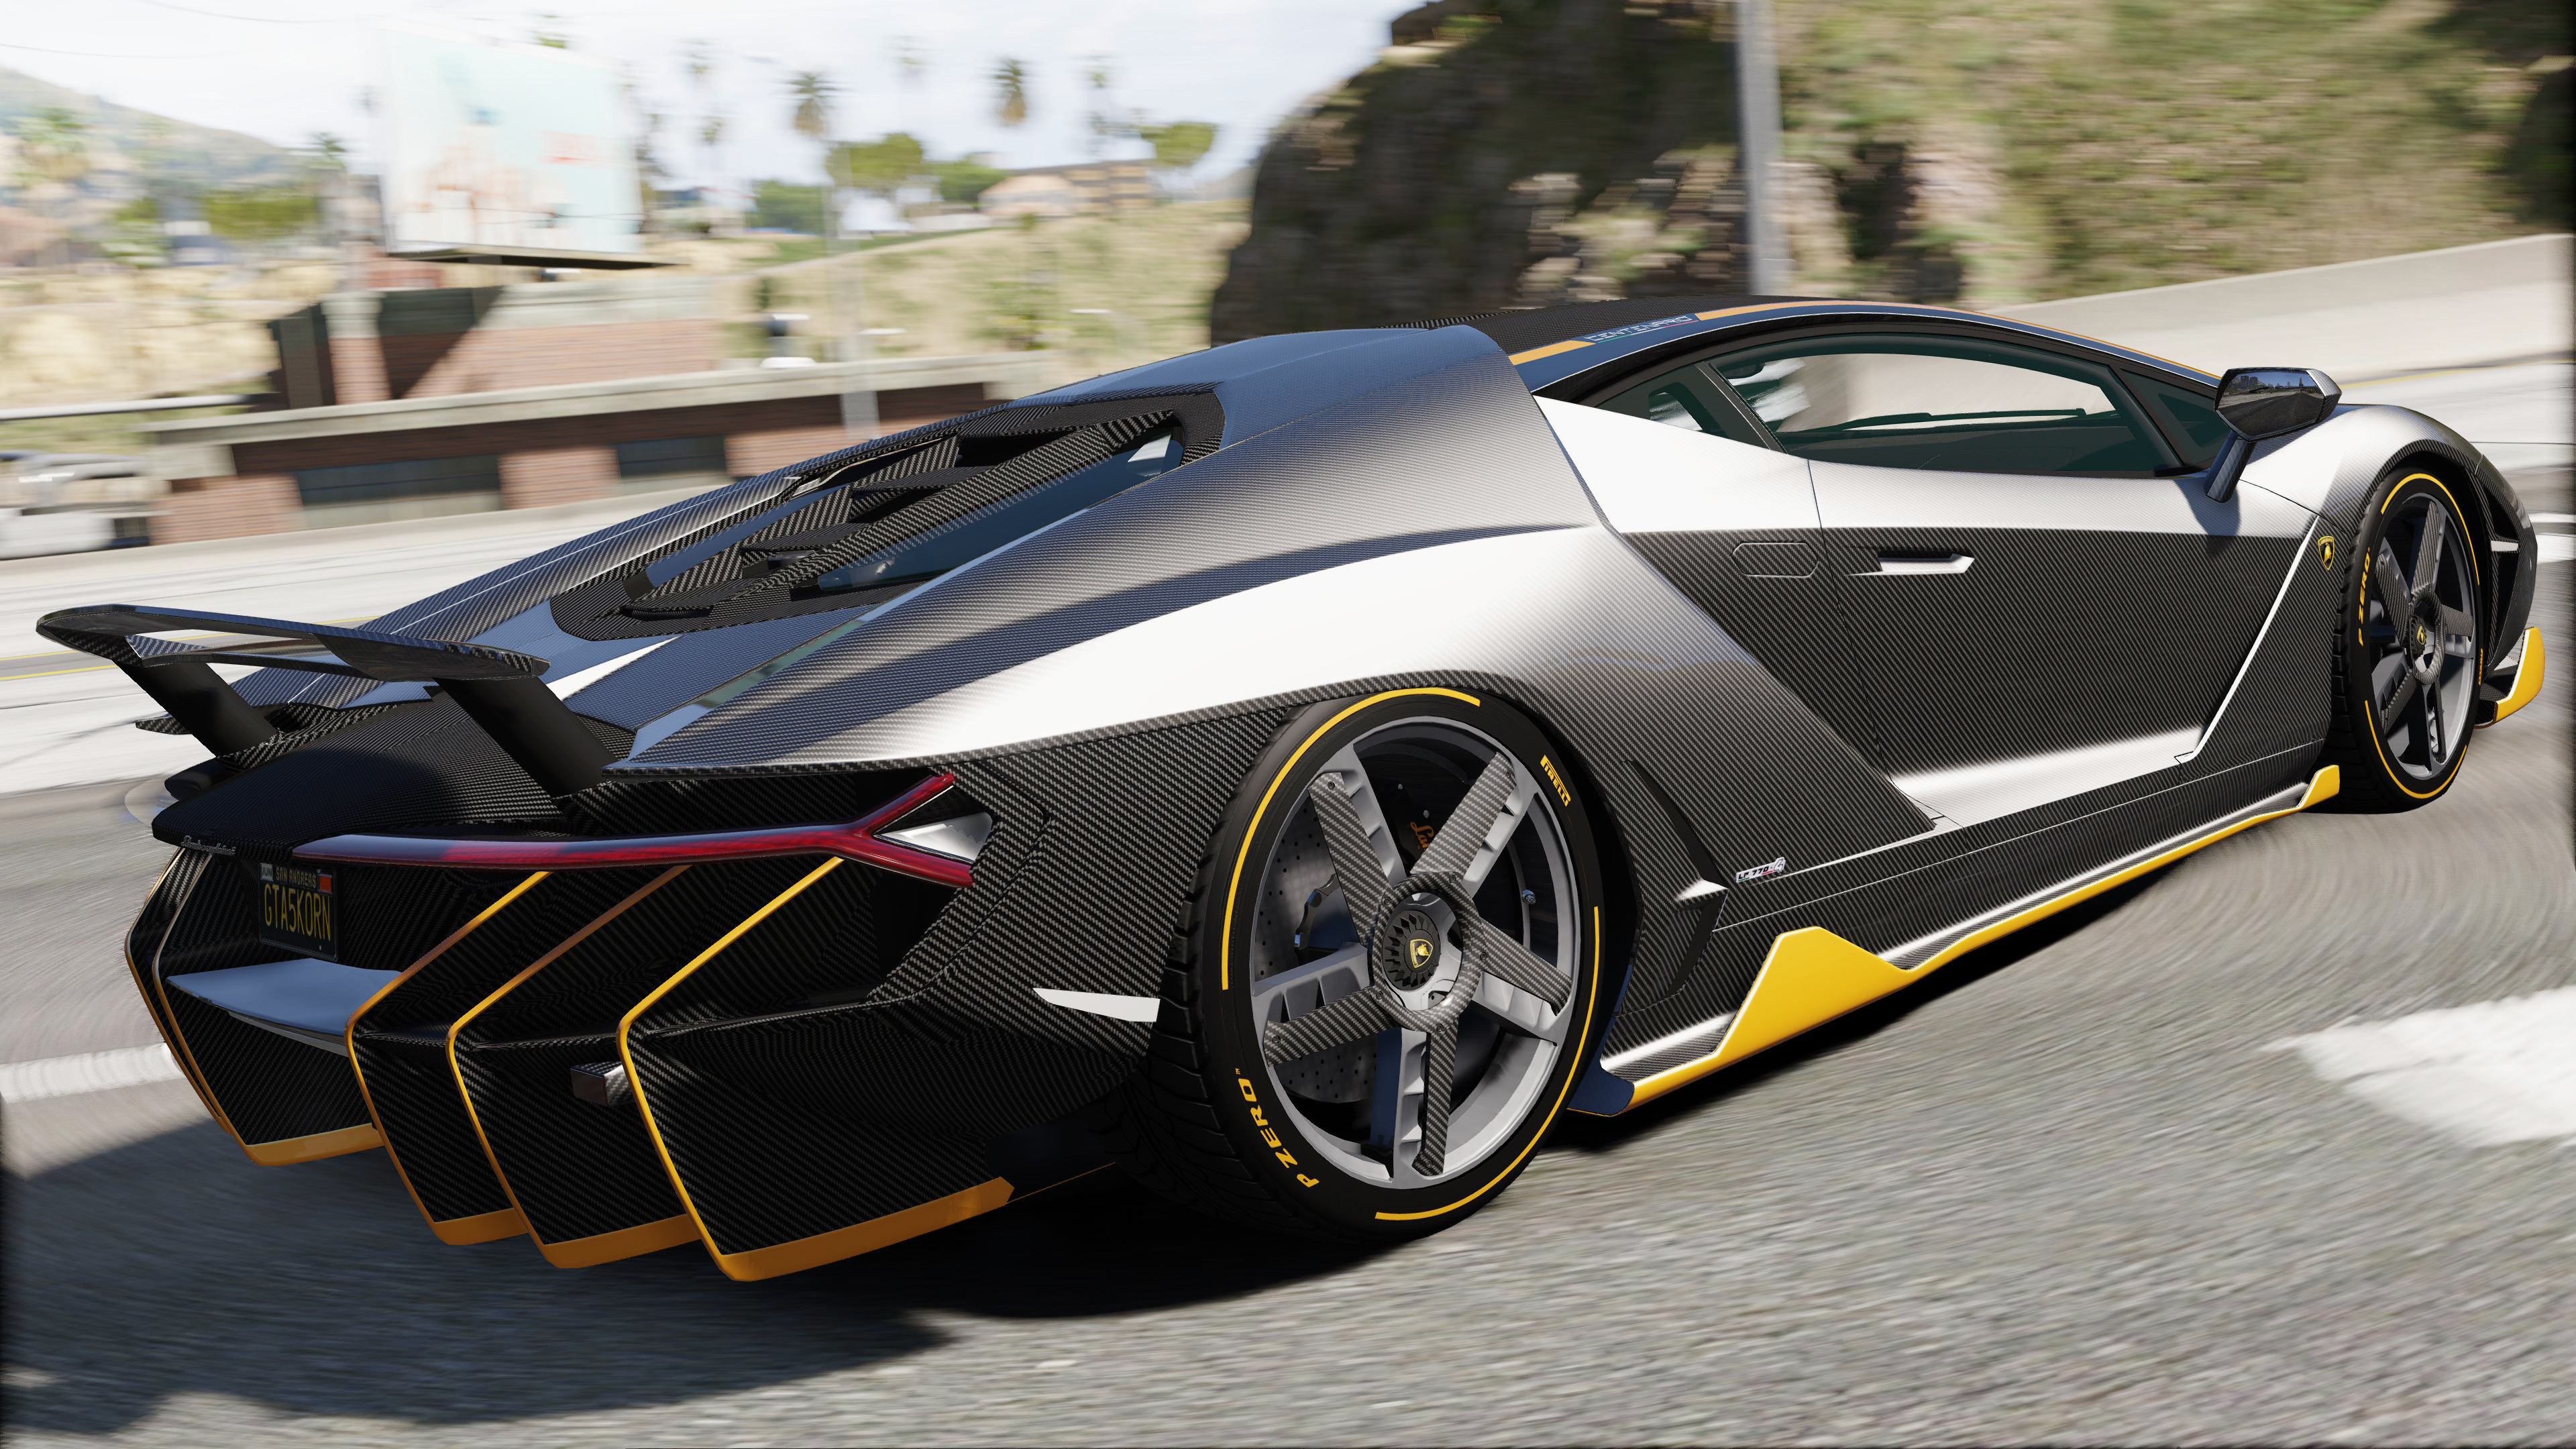 2017 Lamborghini Centenario LP 770-4 для GTA V - Скриншот 2